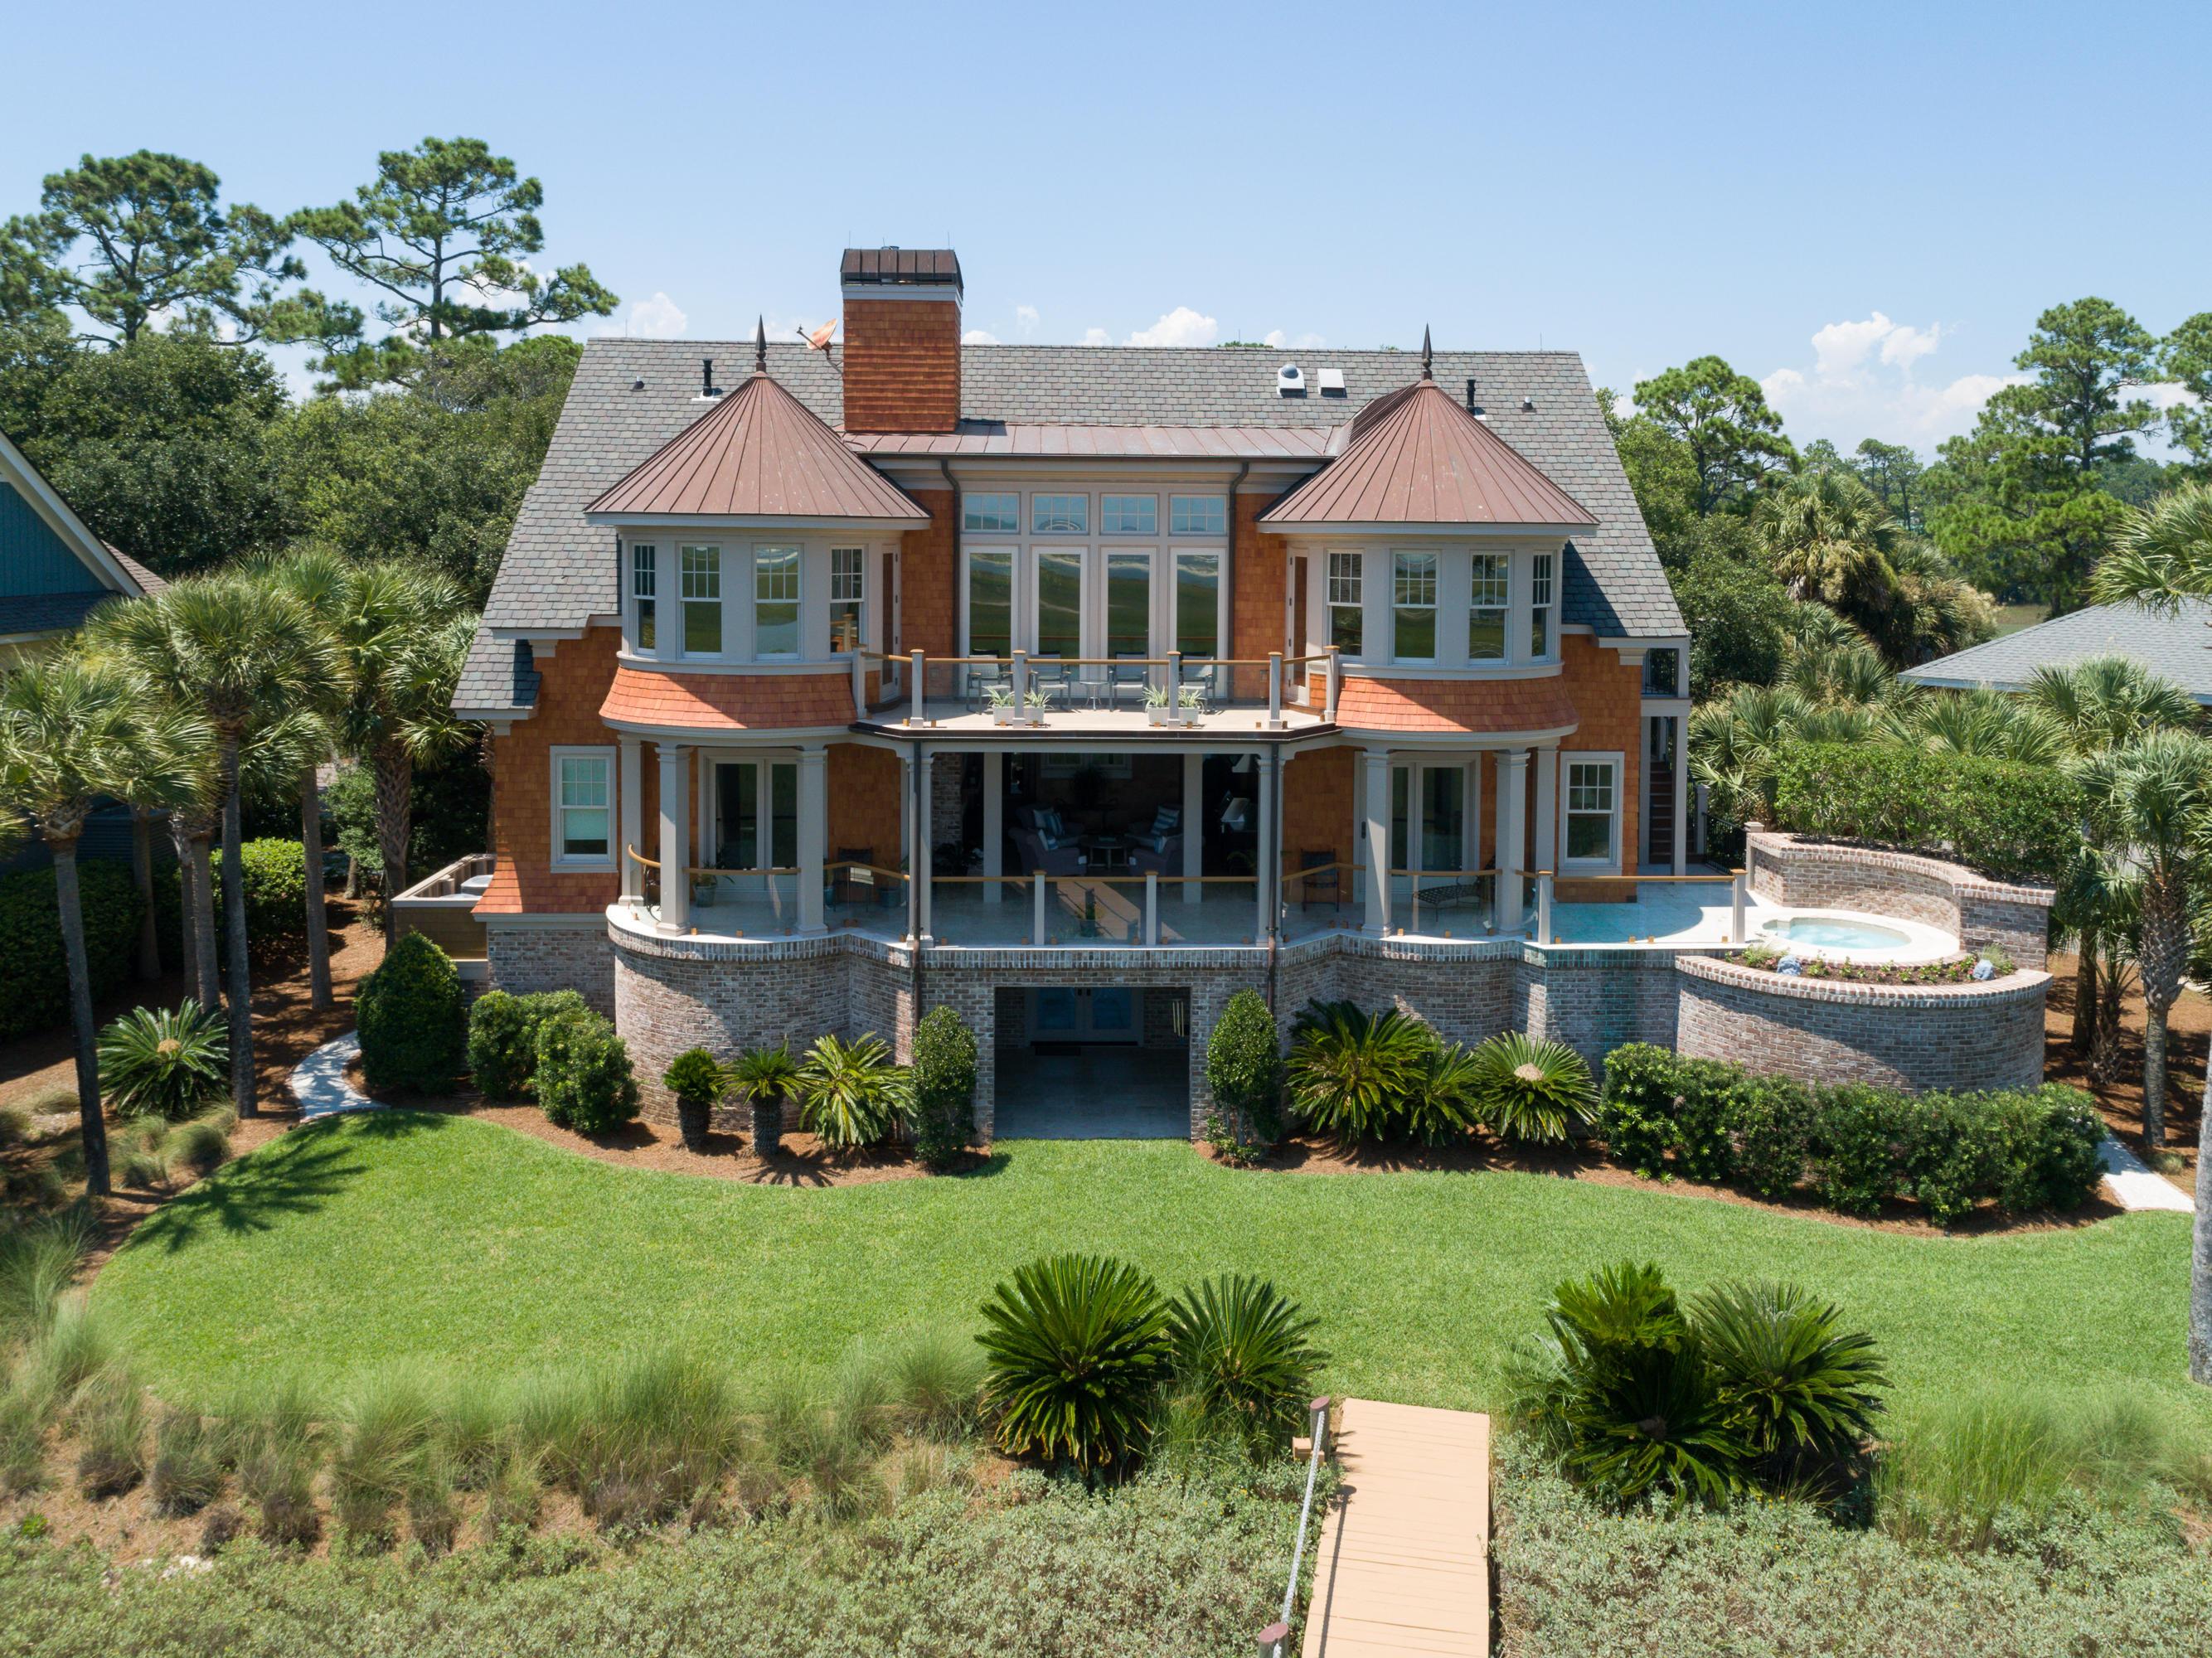 Seabrook Island Homes For Sale - 3037 Marshgate, Johns Island, SC - 3